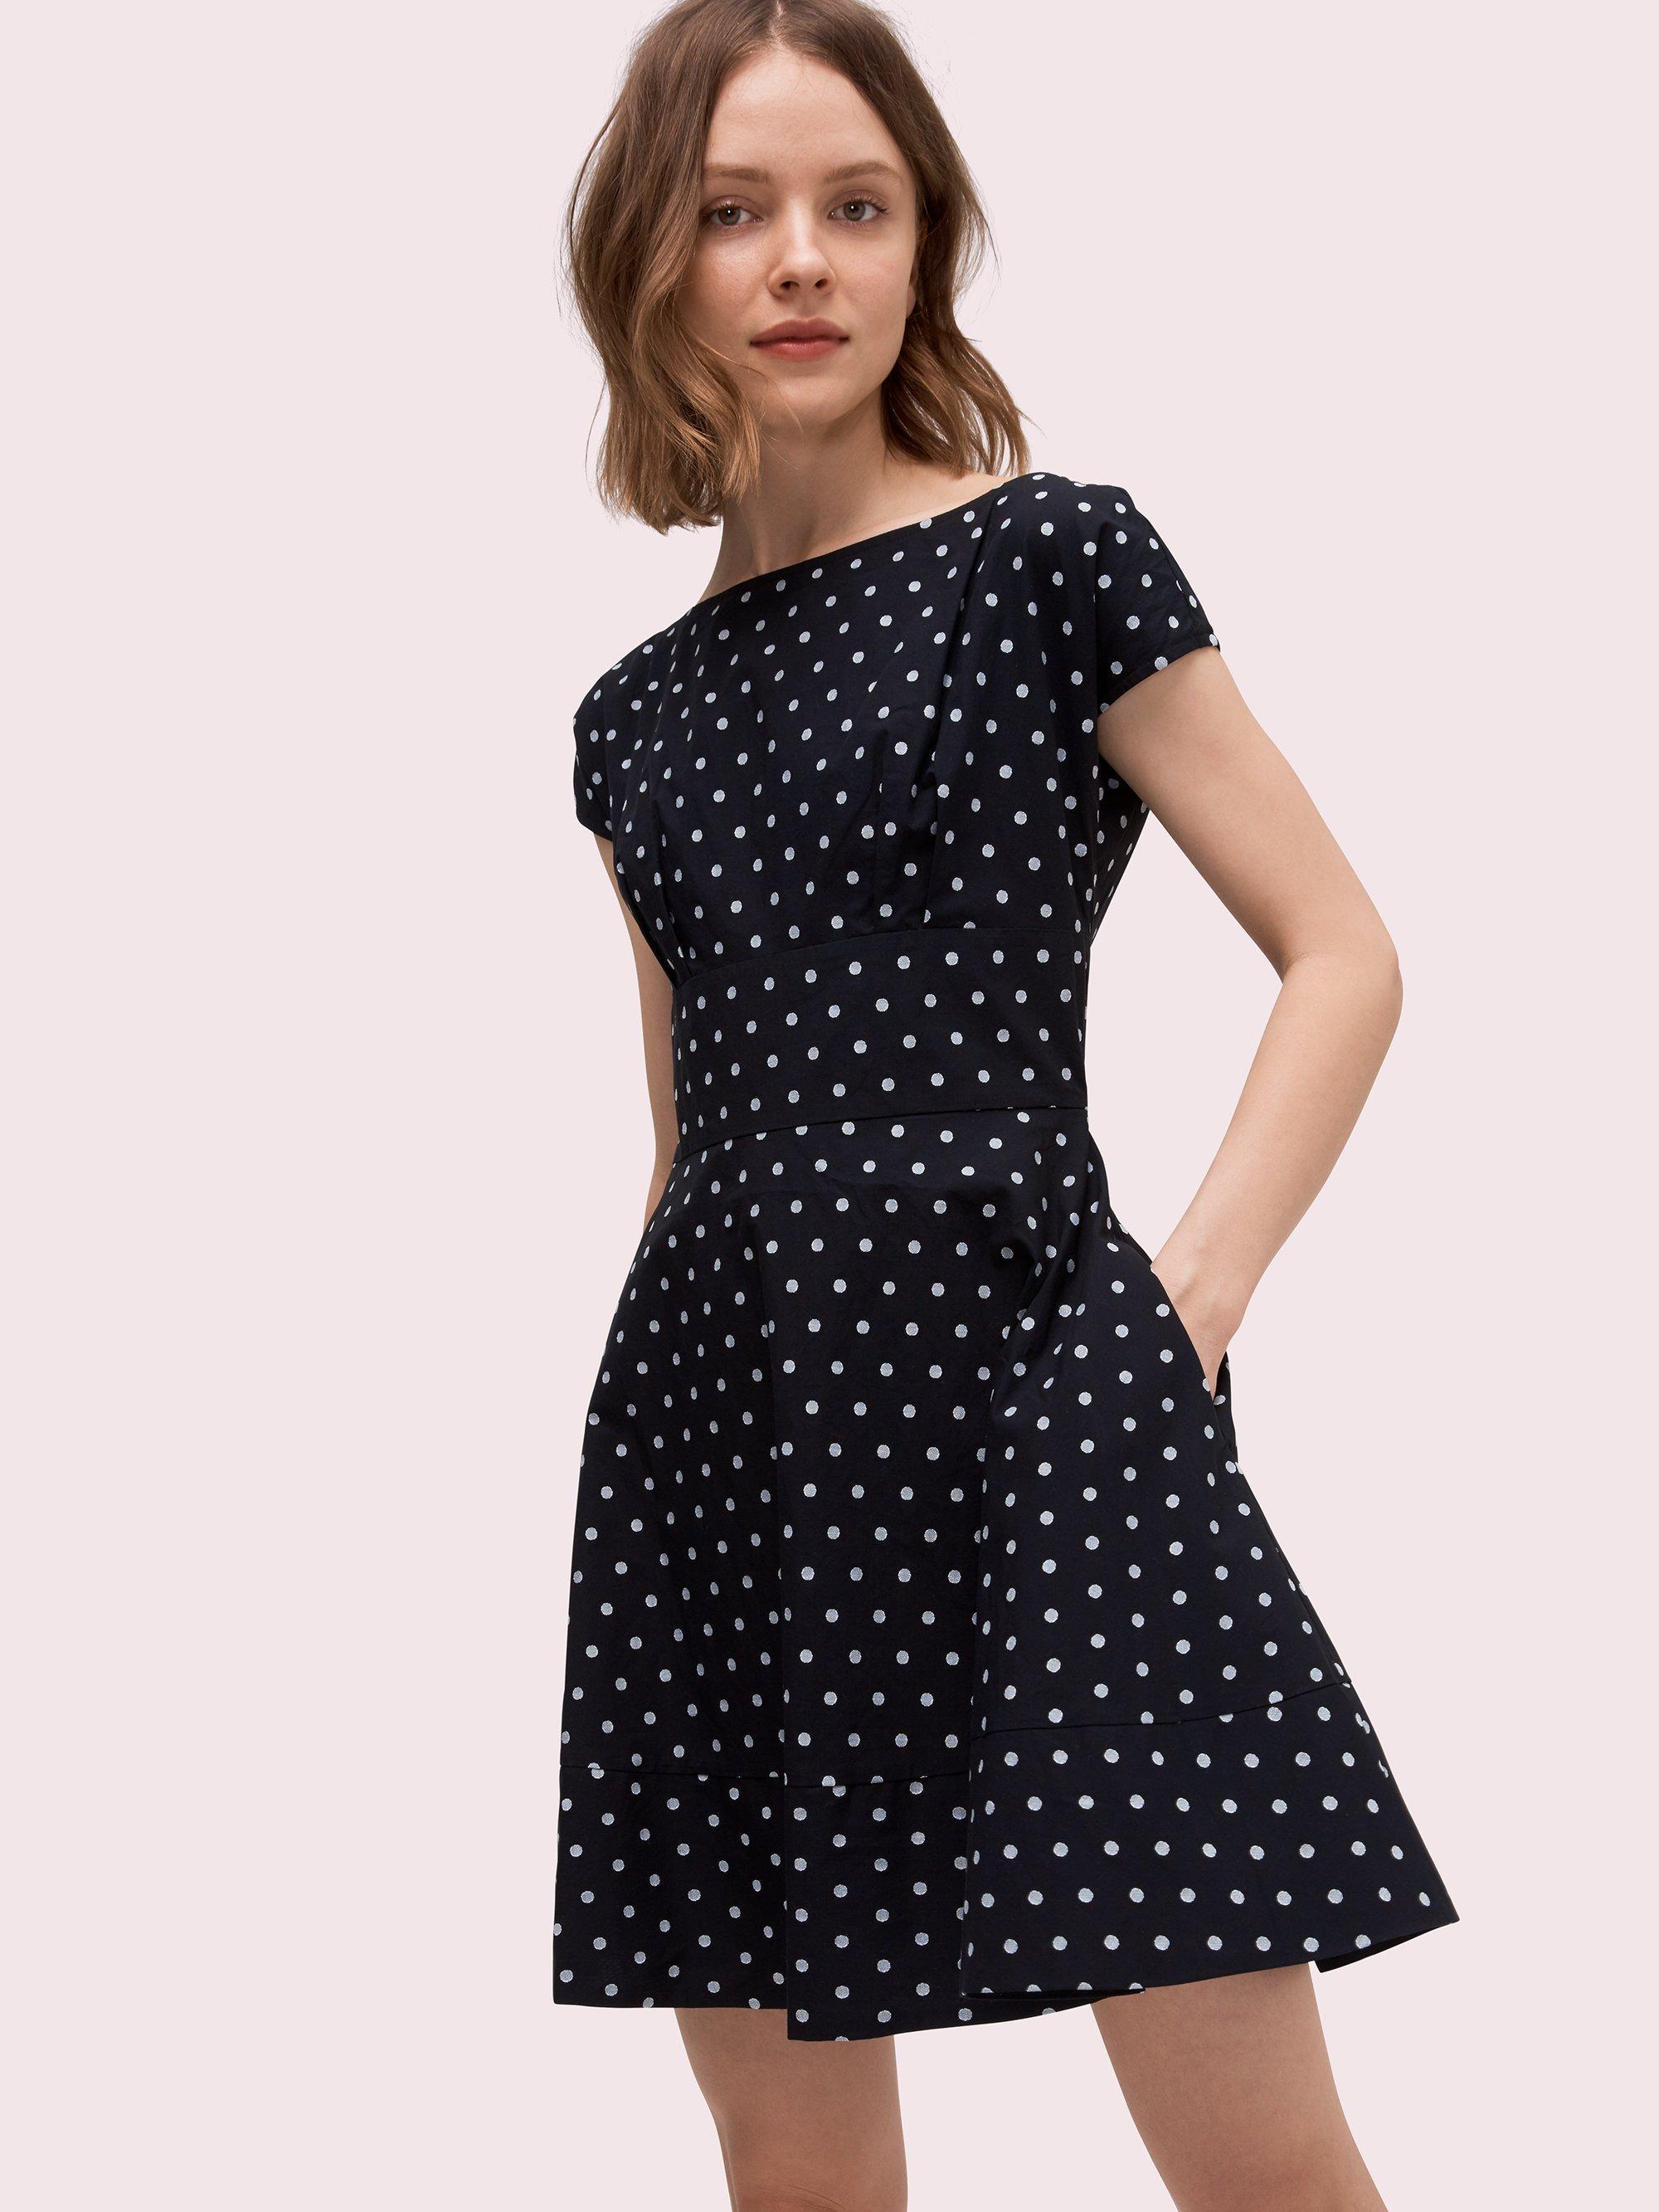 0f5f411c23af Lyst - Kate Spade Dot Cotton Fiorella Dress in Black